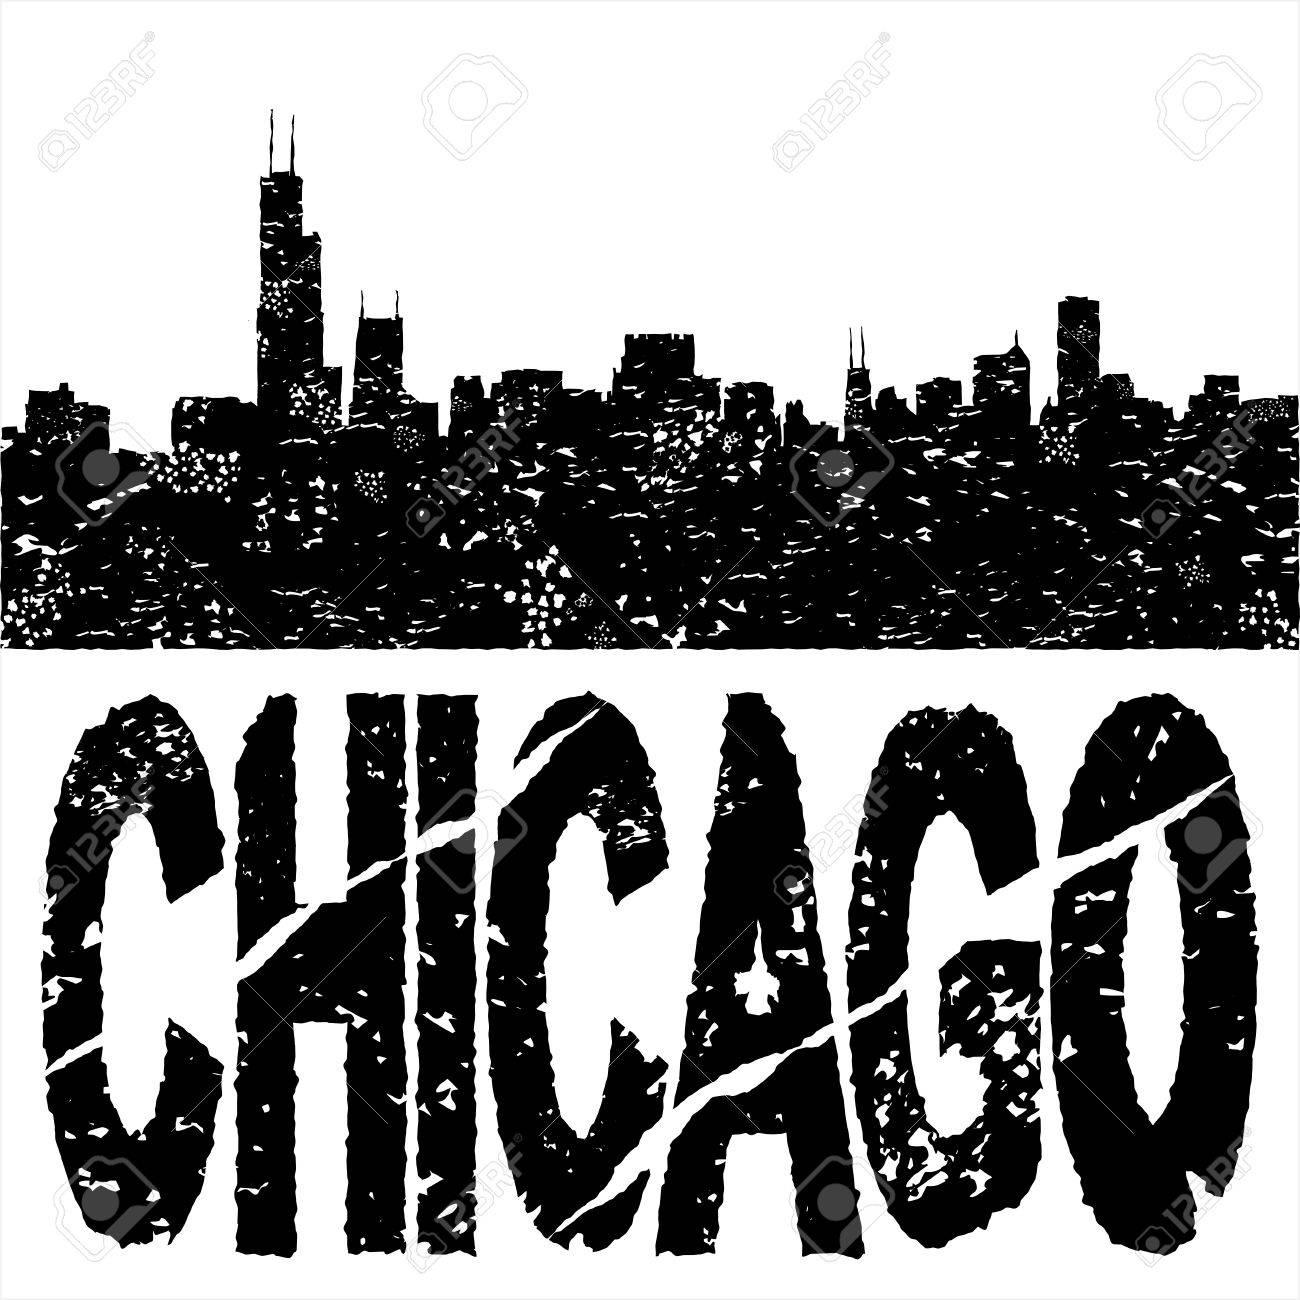 Grunge Chicago skyline with text illustration Stock Illustration - 10679257